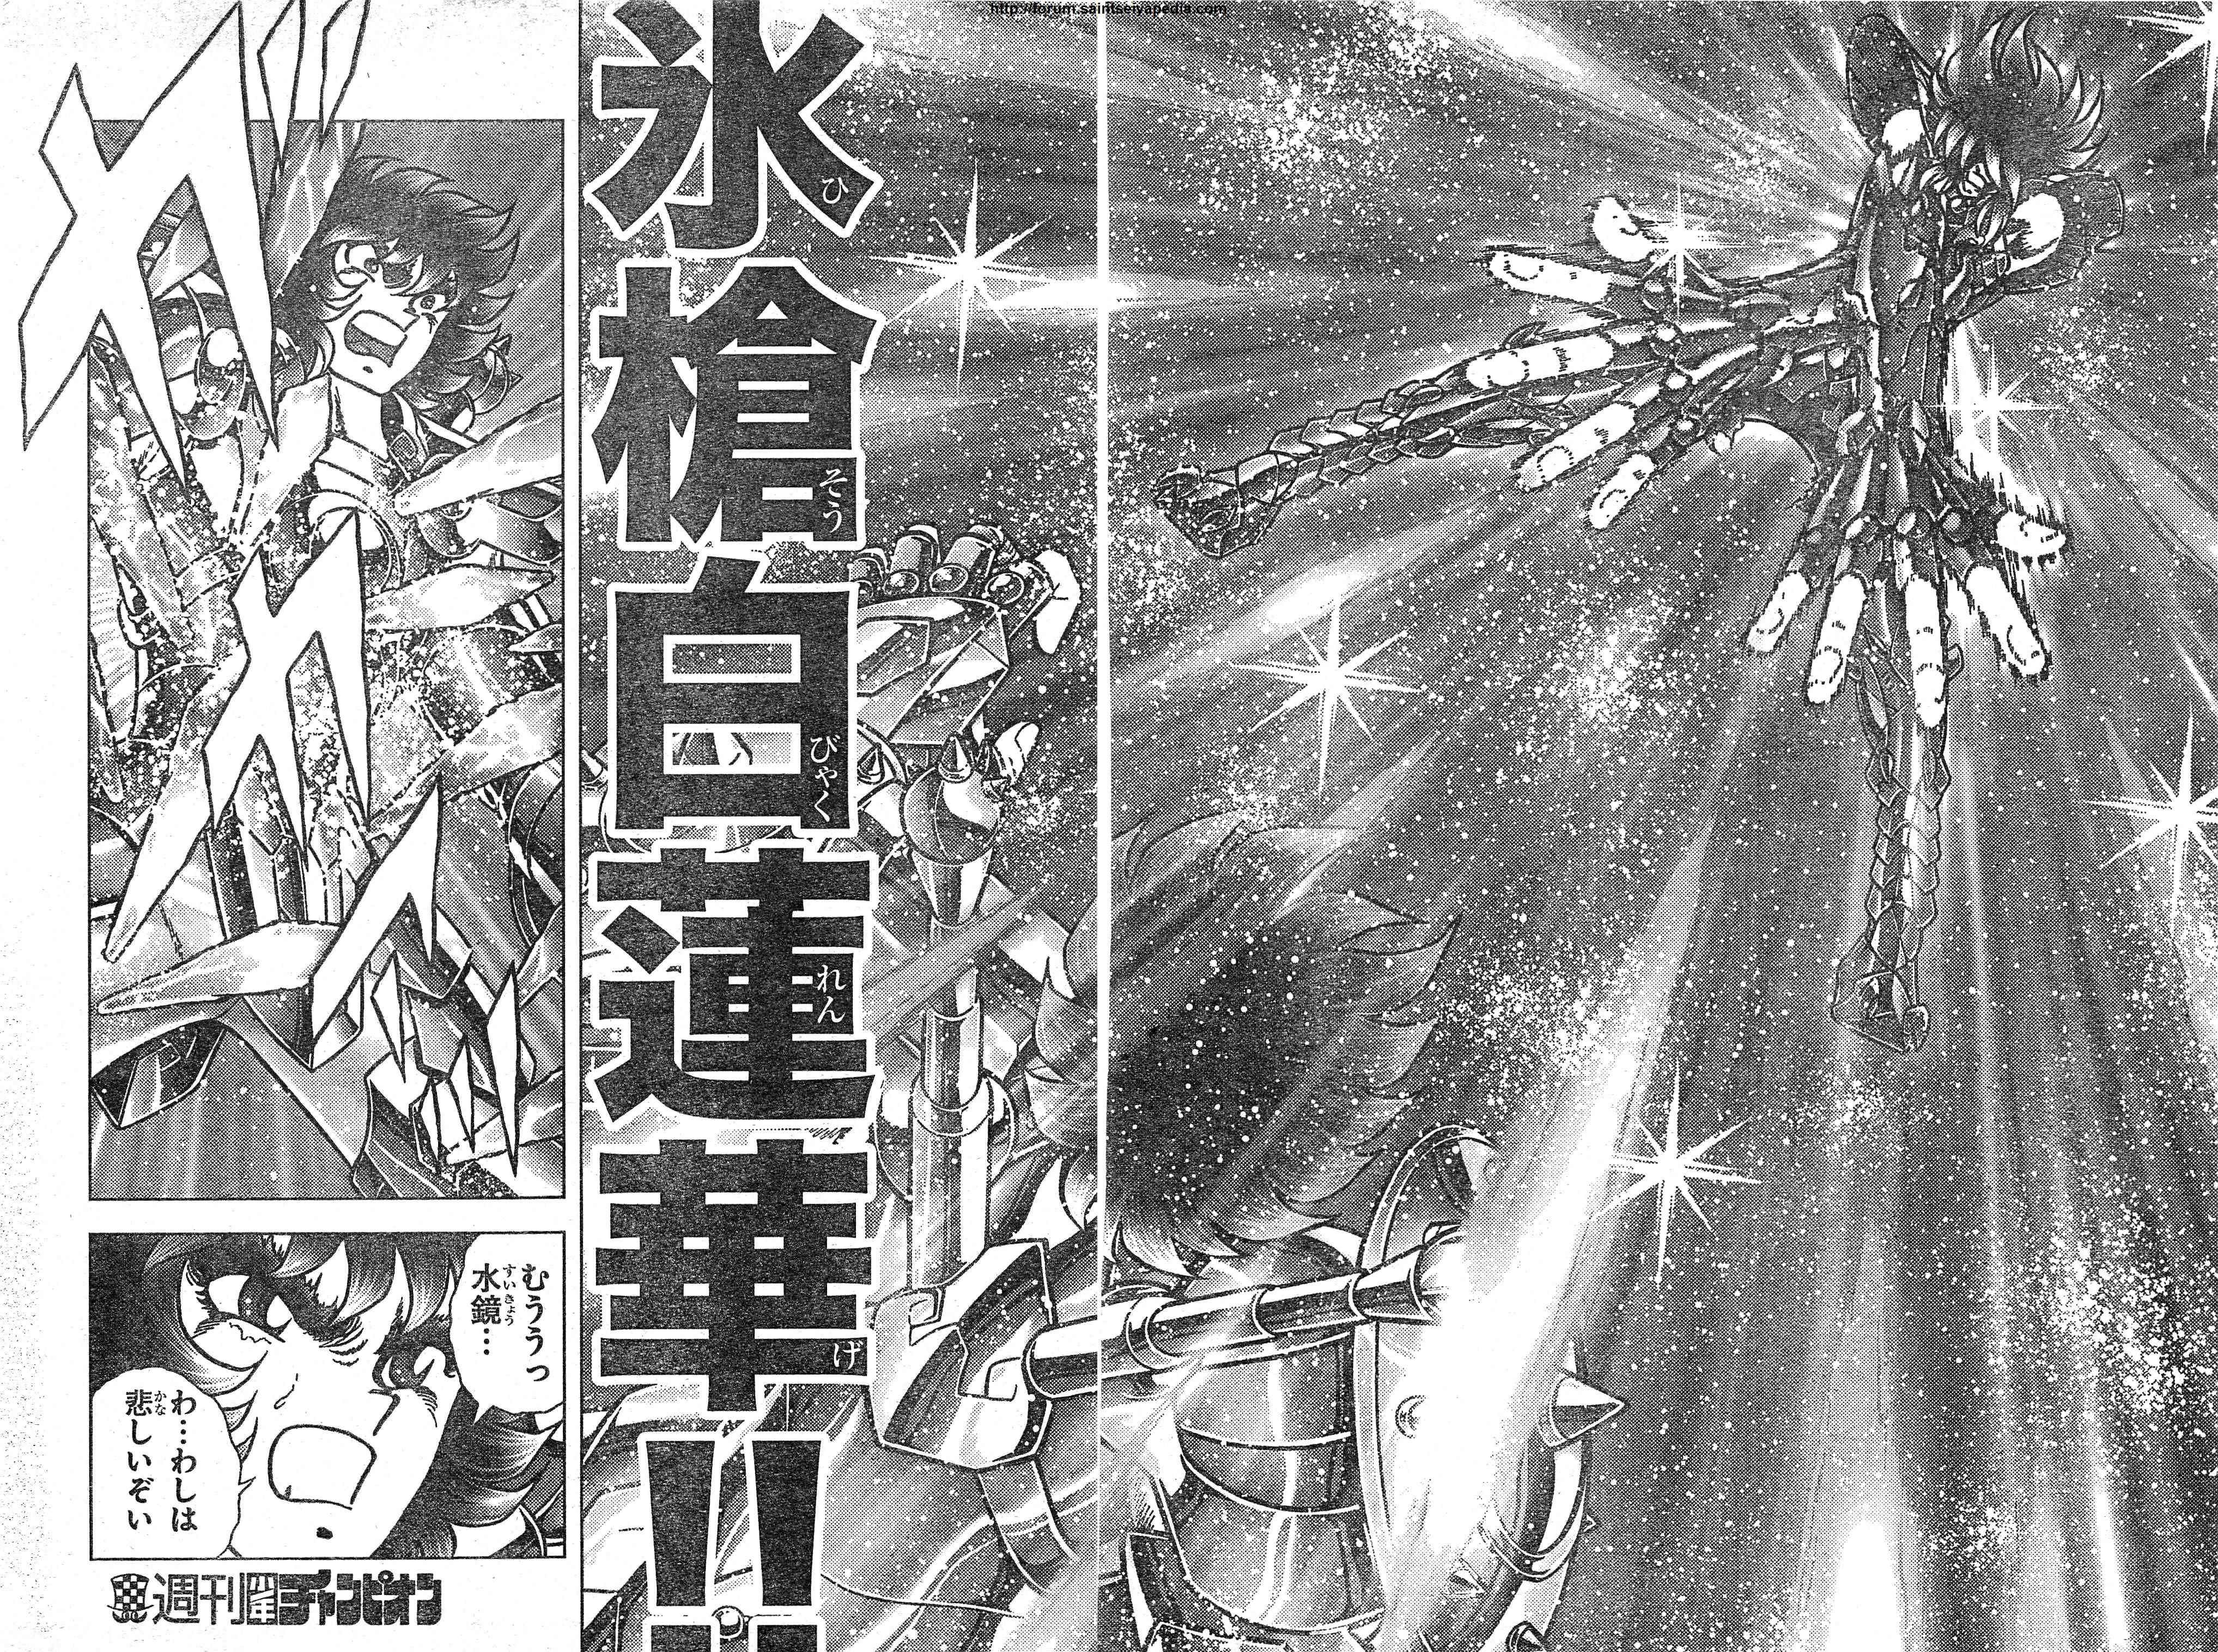 Saint Seiya - The Next Dimension - Chapitre 55 - 21-22